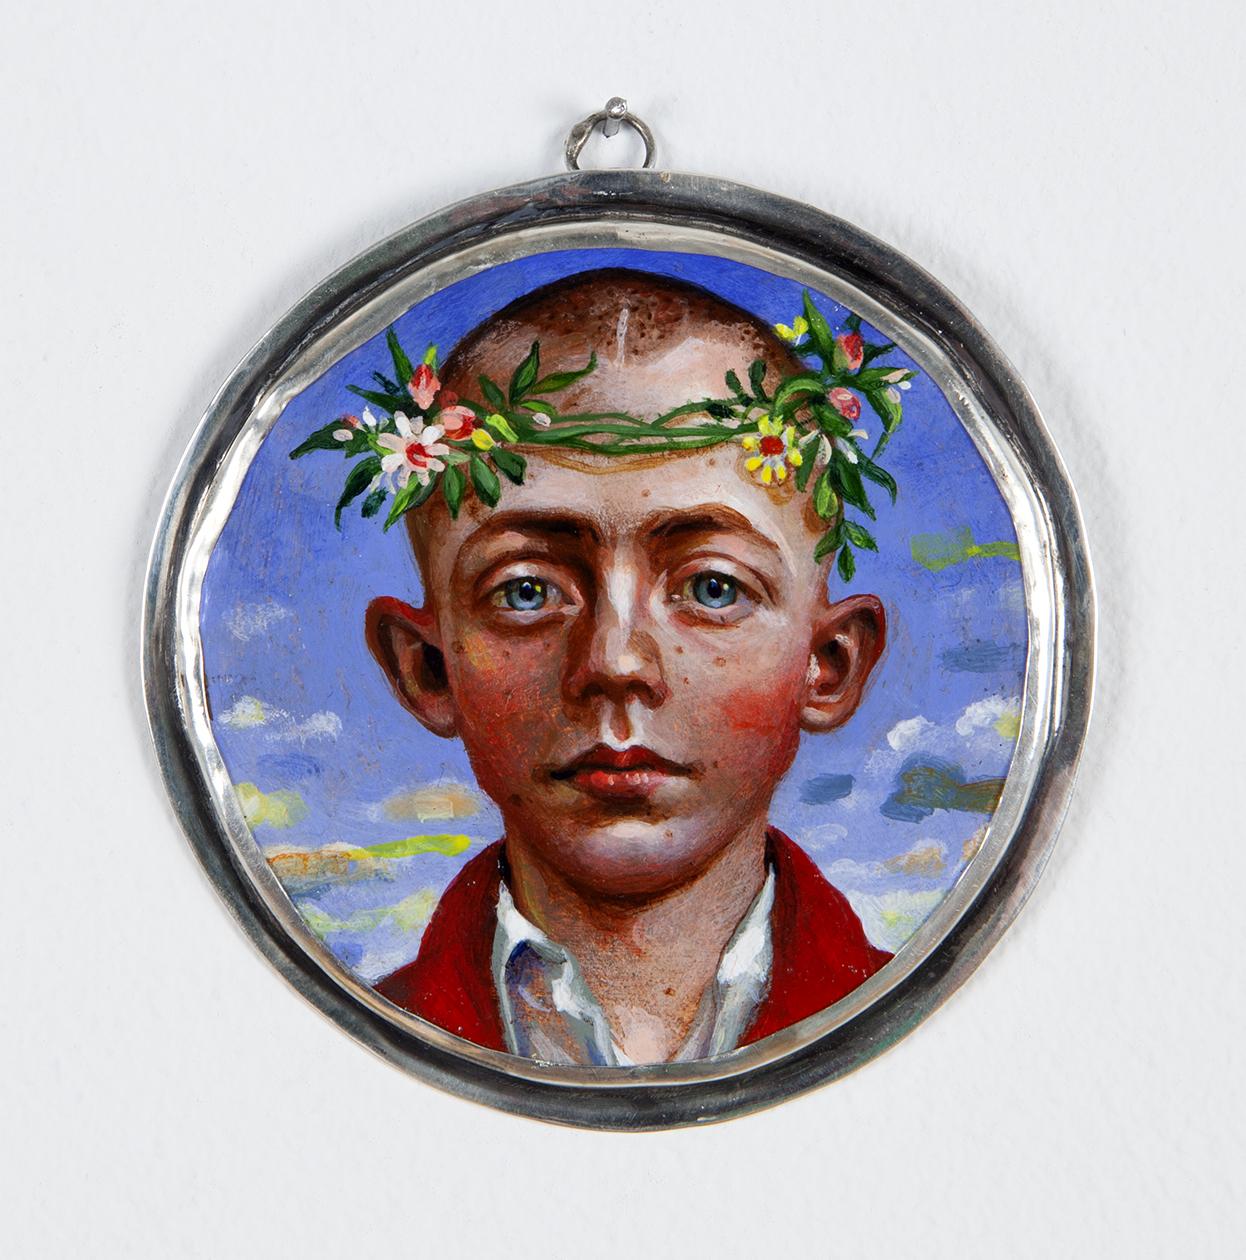 Beltane Boy, 2019 acrylic on wood 3 inch diameter